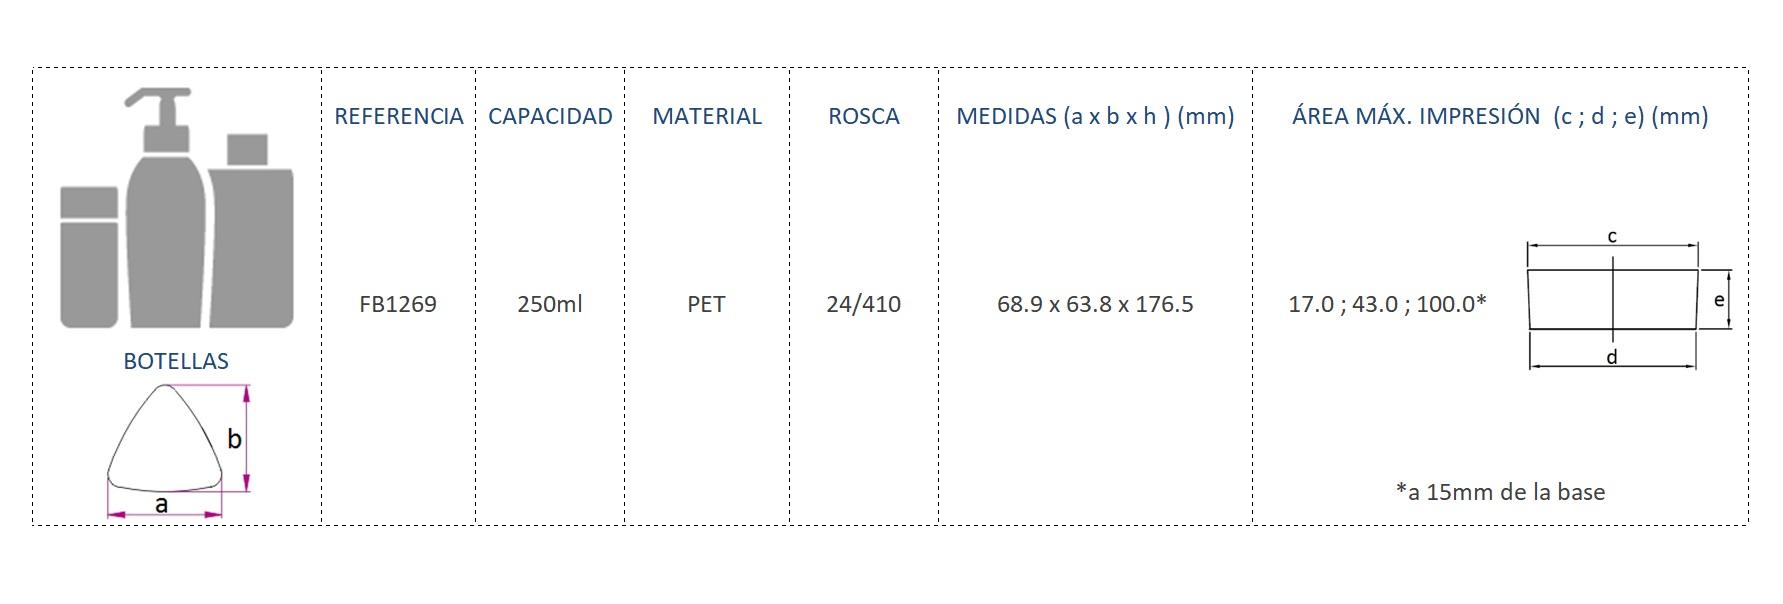 Cuadro de materiales botella FB1269